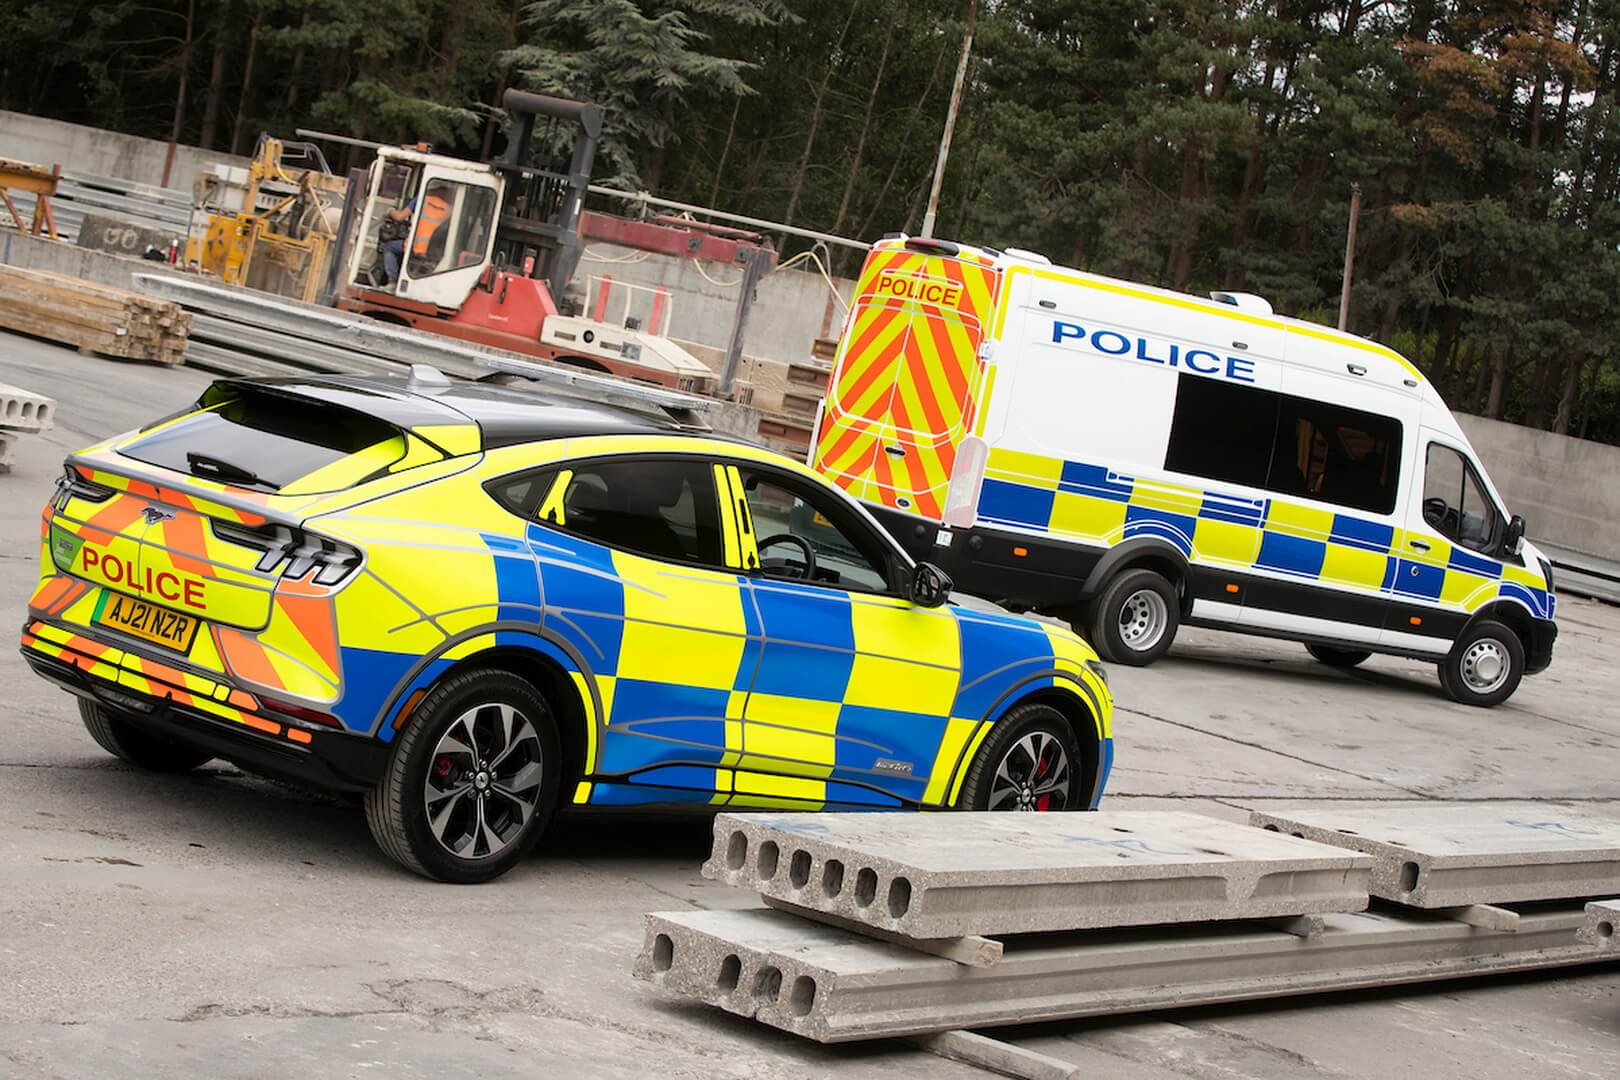 Полицейский Ford Mustang Mach-E в Великобритании